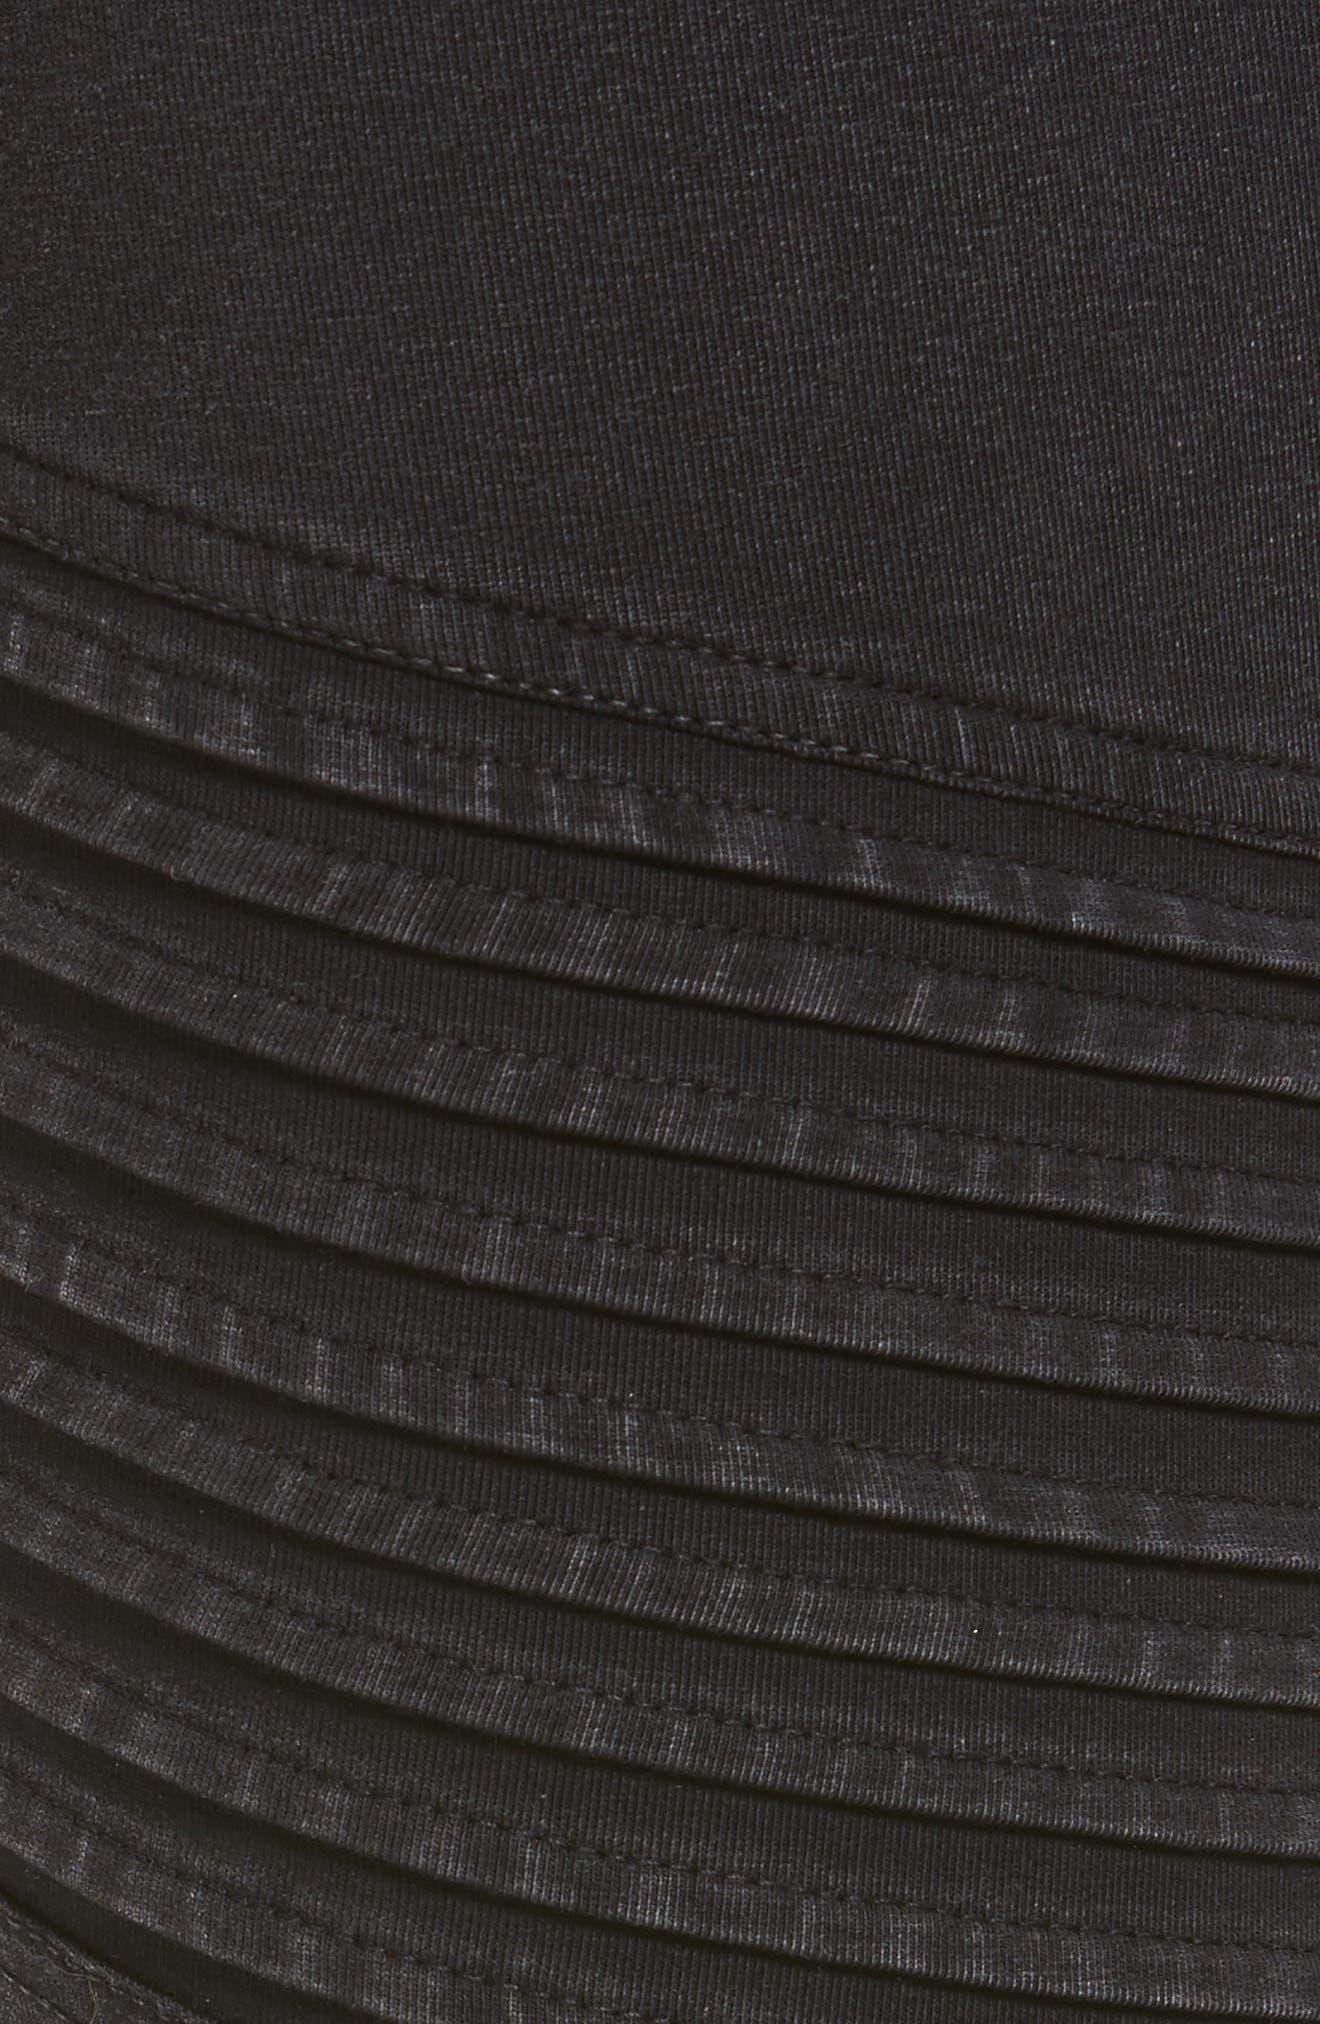 Moto Leggings,                             Alternate thumbnail 5, color,                             Black